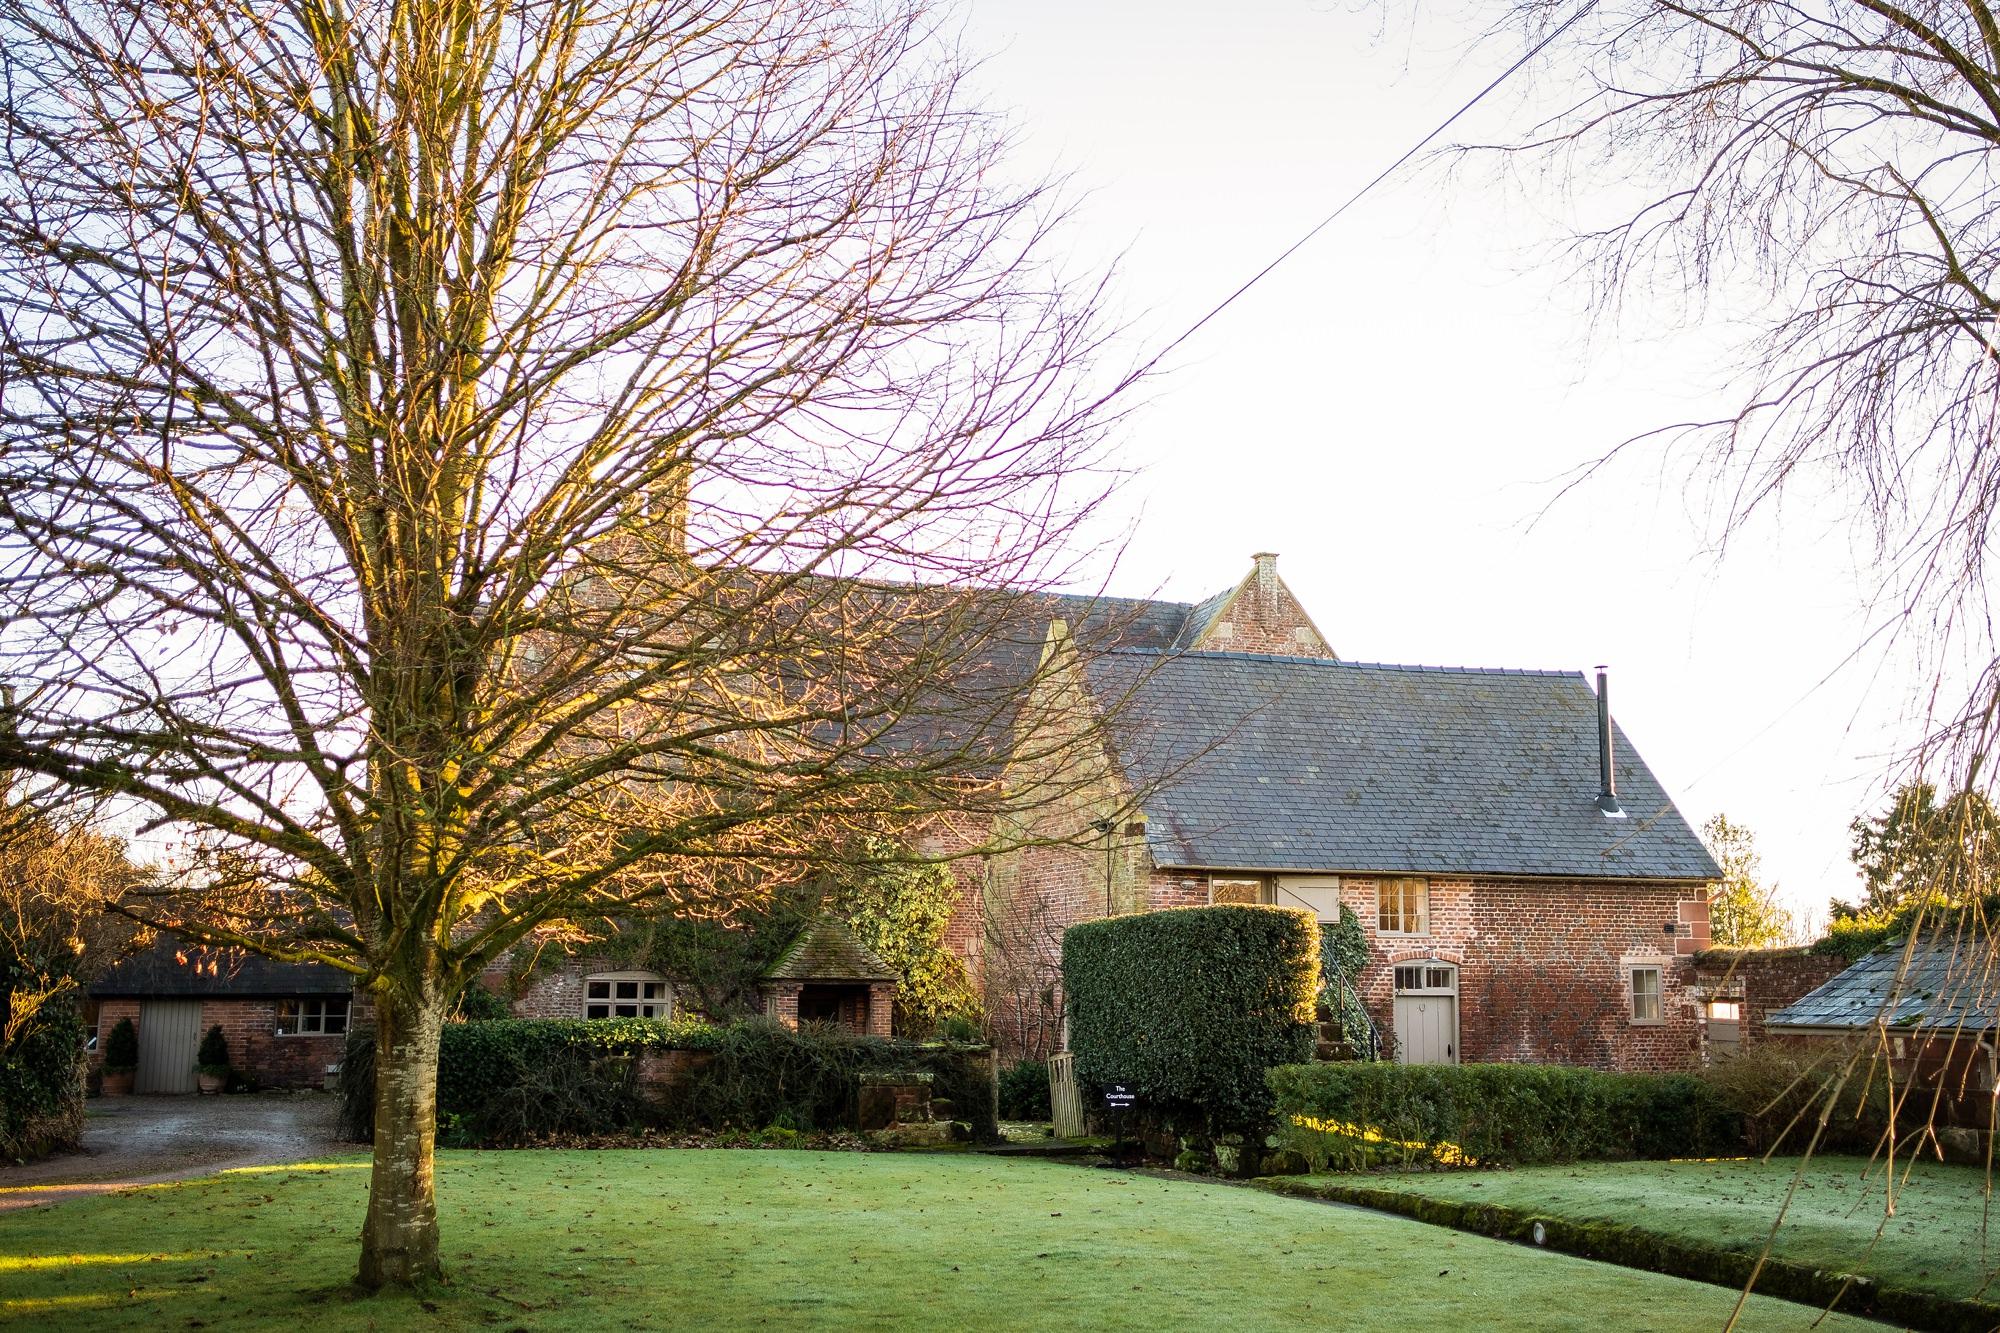 pimhill barn cottage